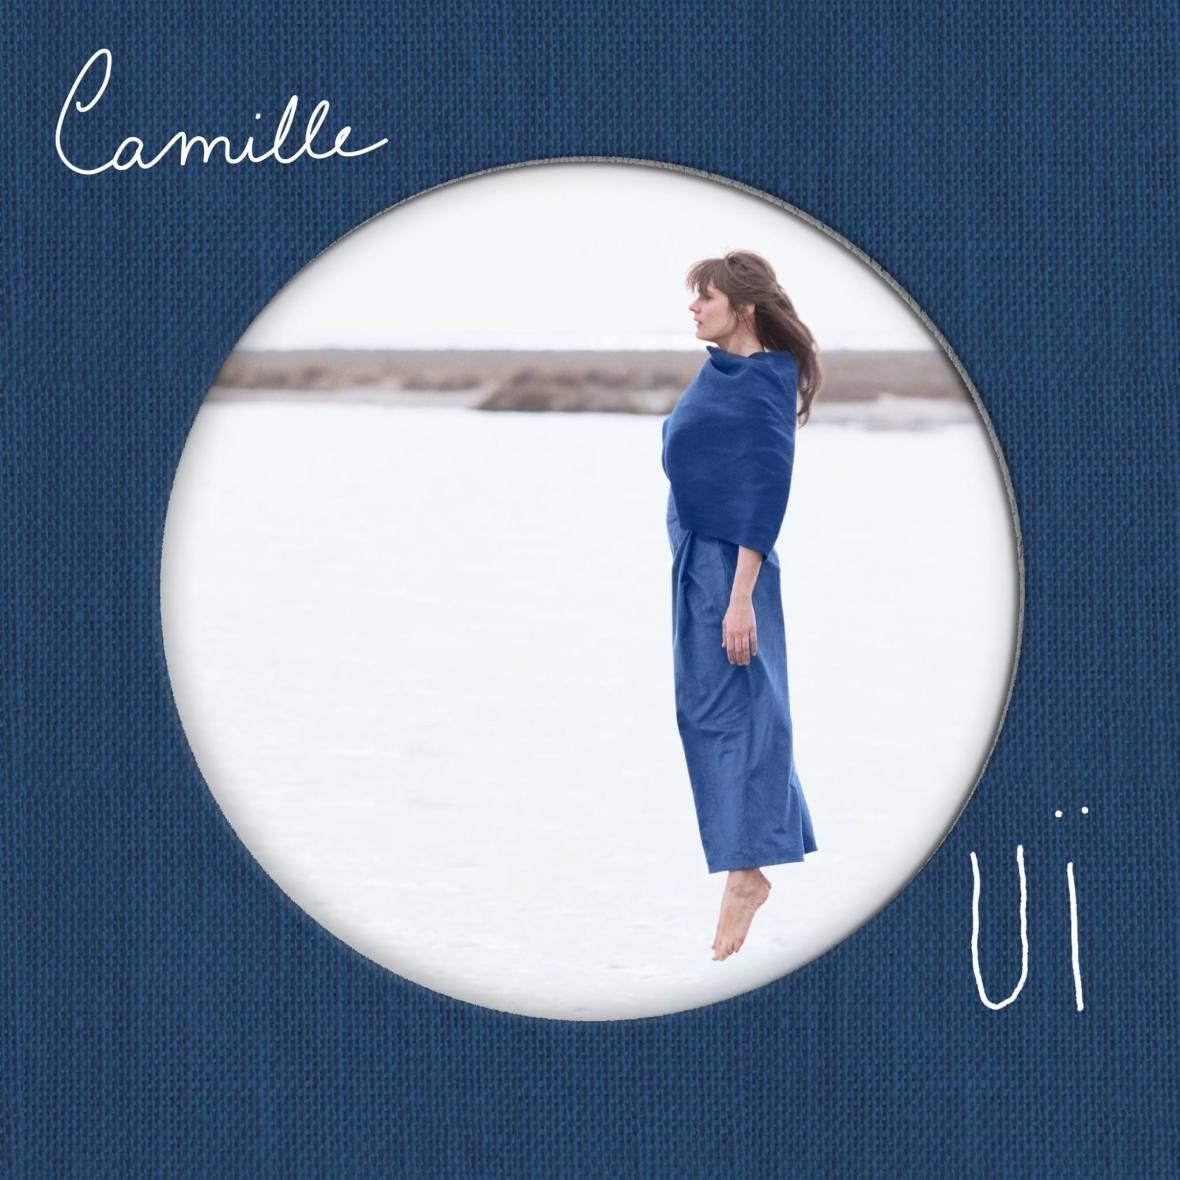 Camille, Uï